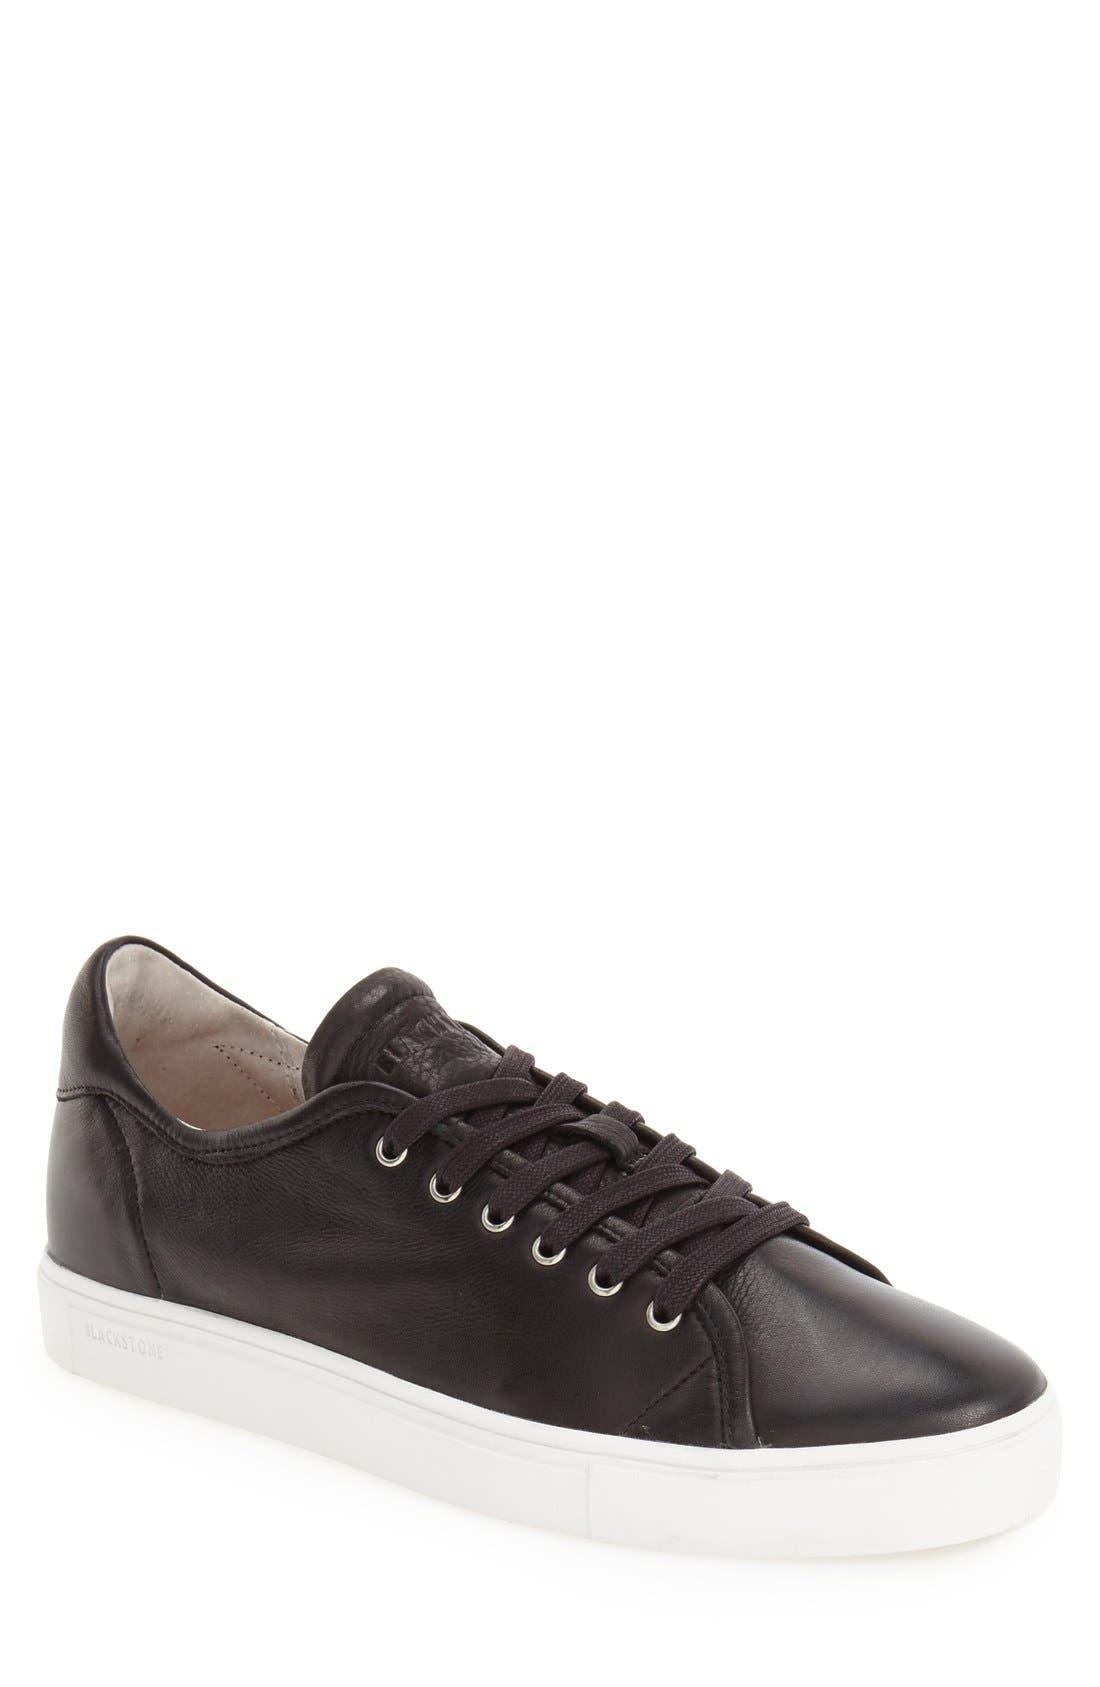 Blacktone 'LM24' Sneaker,                             Main thumbnail 1, color,                             001